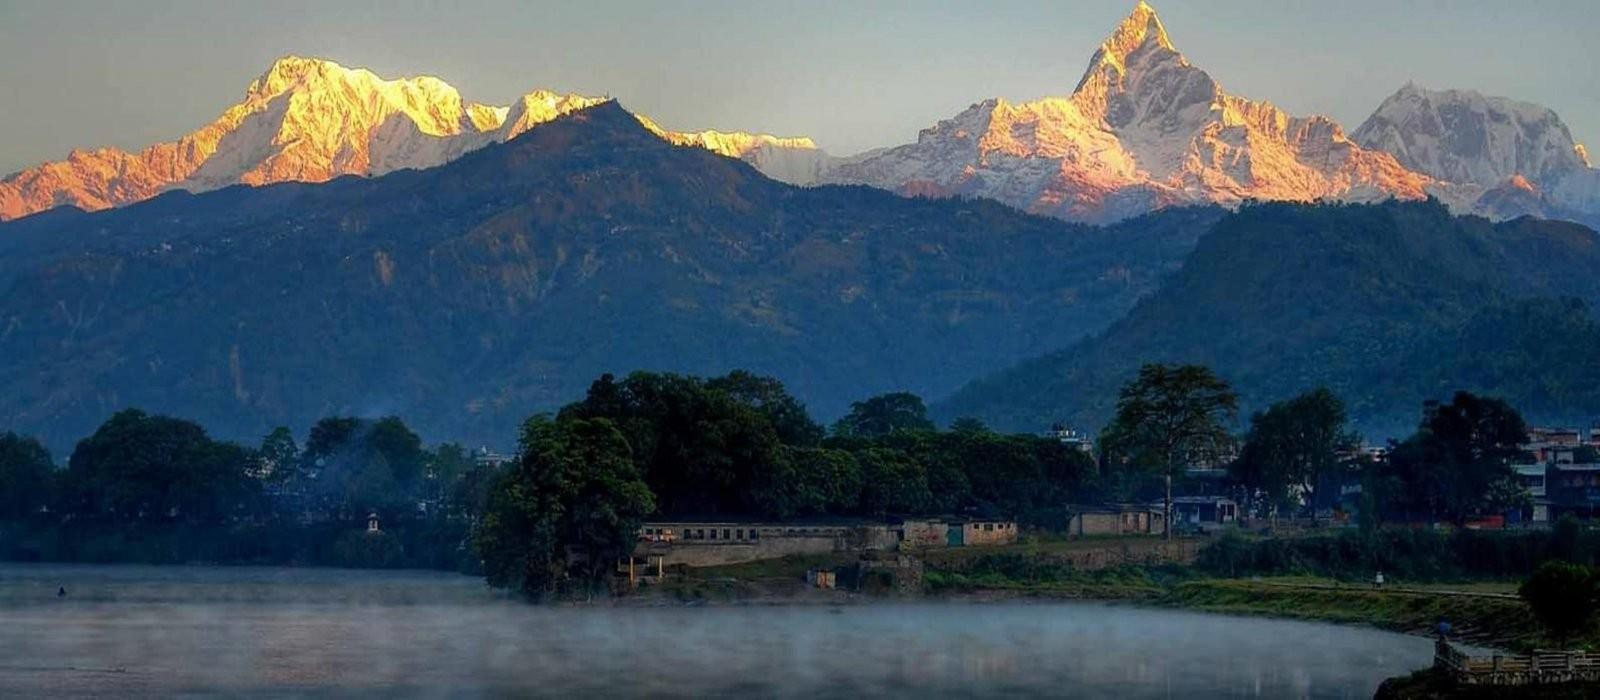 Pokhara Sightseeing Day Tour